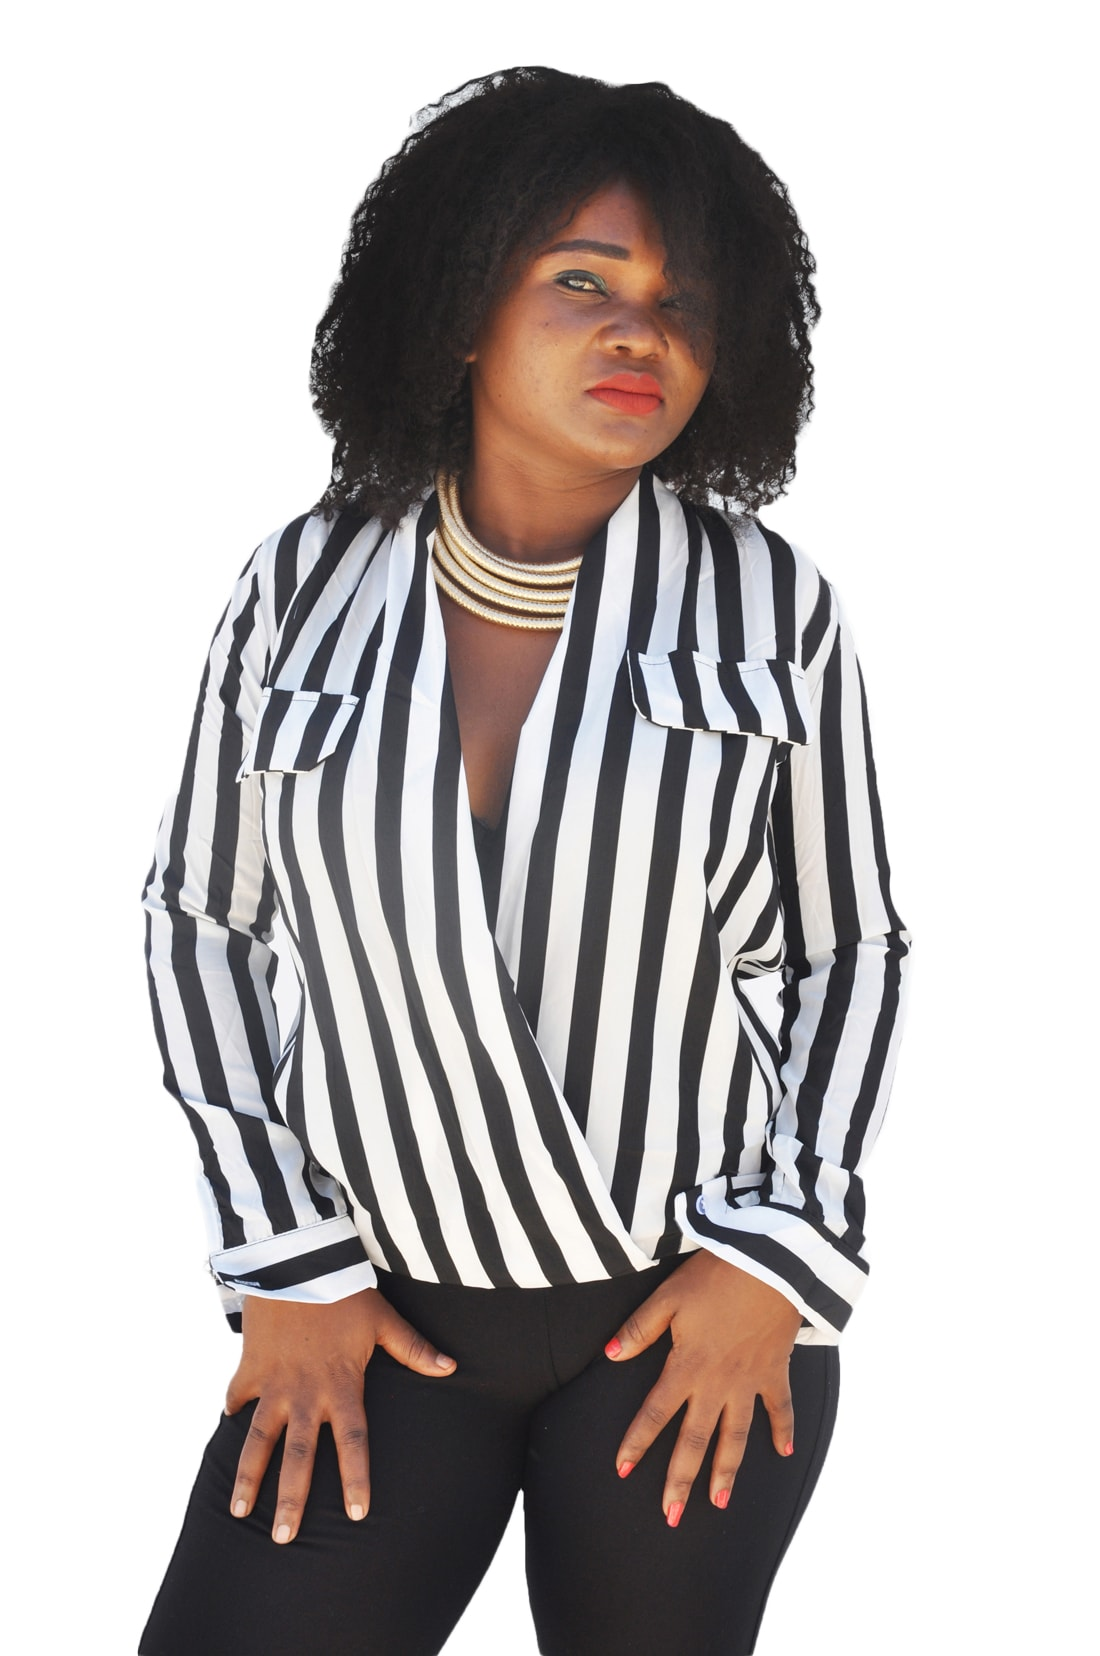 M0221 blackwhite1 Blouses Tops Shirts maureens.com boutique